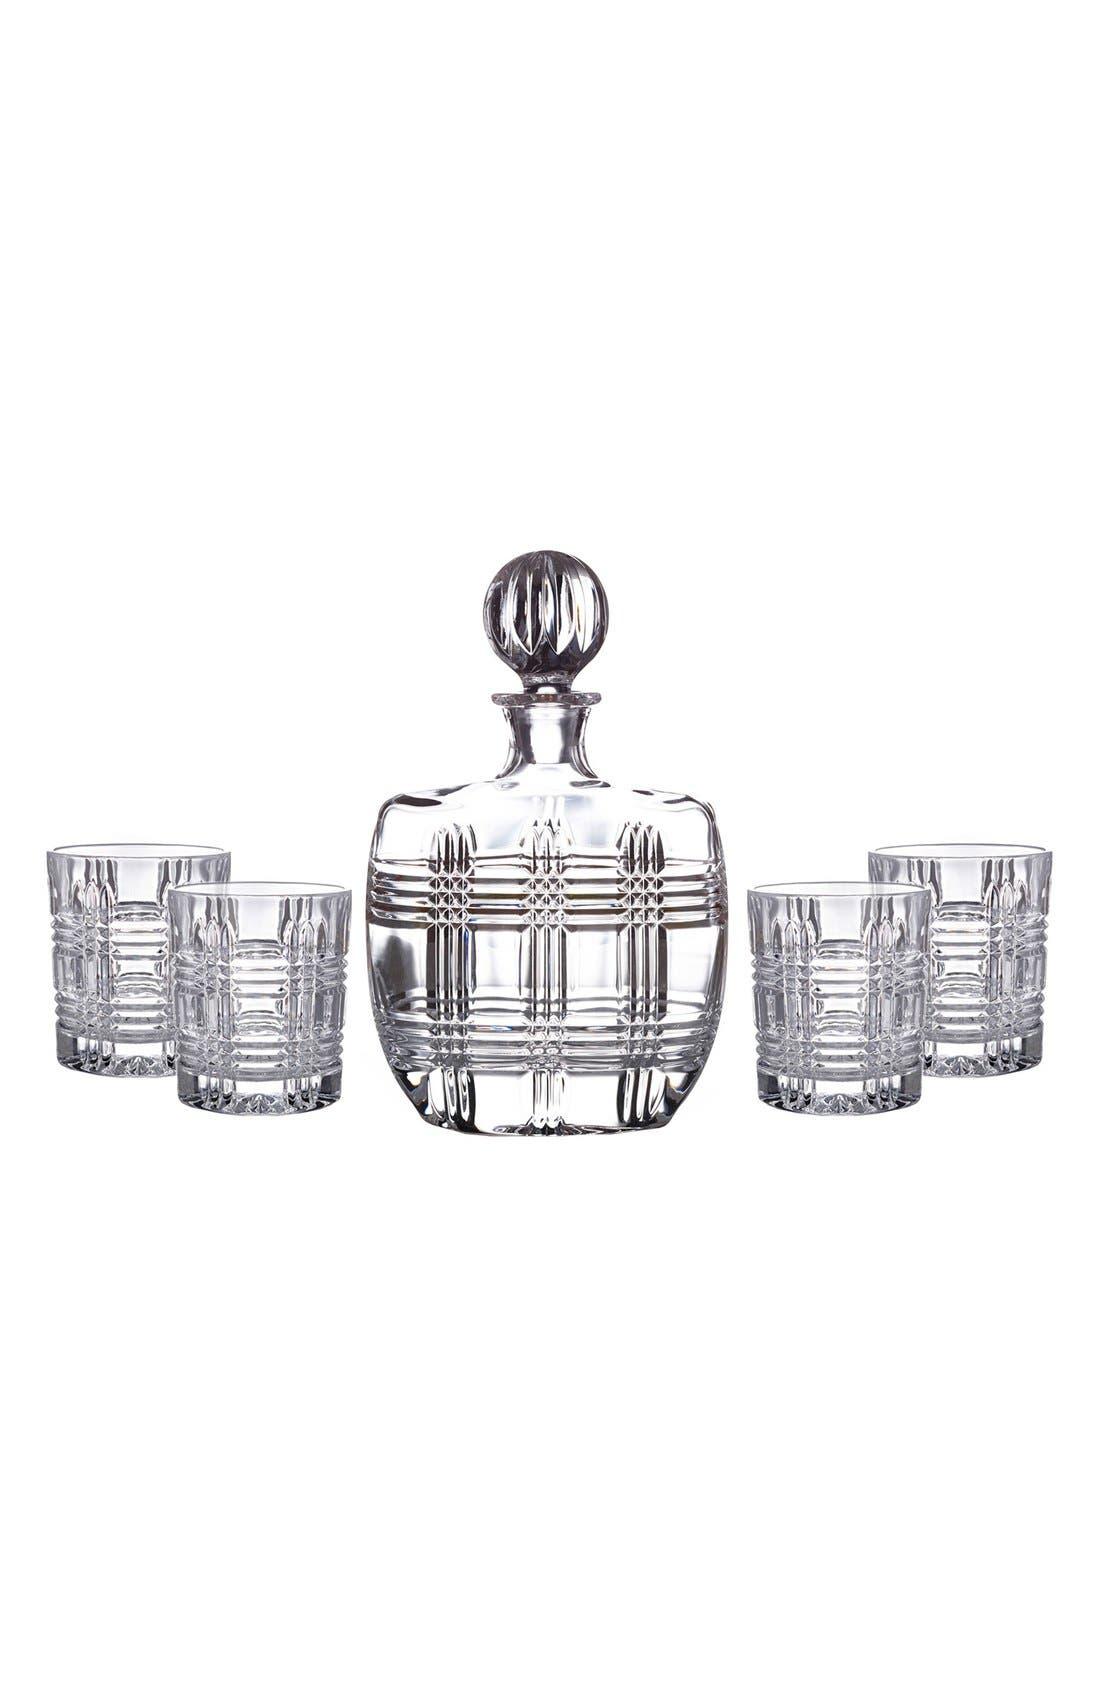 Bridgeport 5-Piece Decanter & Whiskey Glasses Set,                         Main,                         color, 100